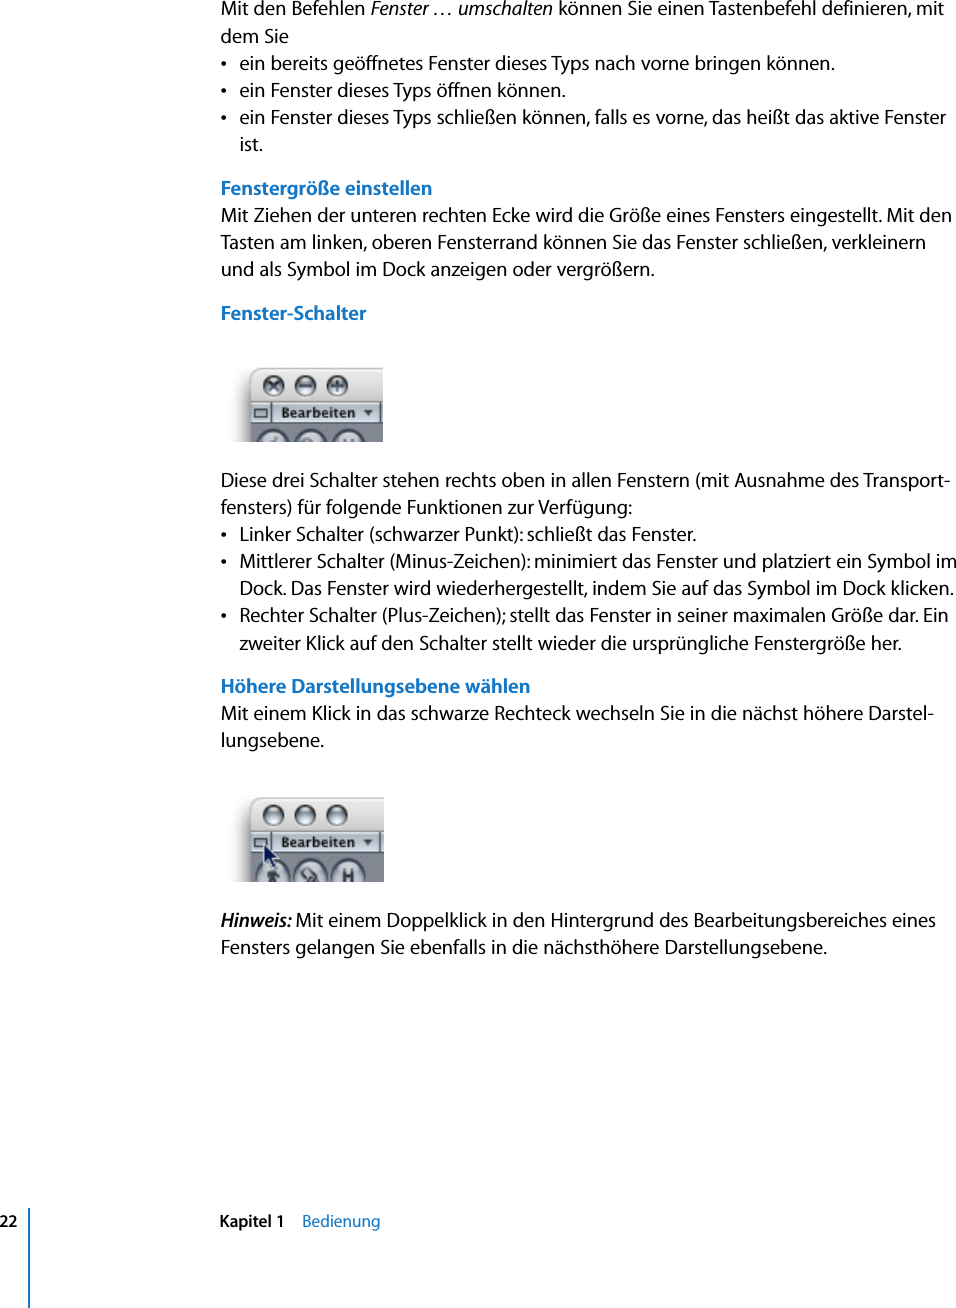 Gut bekannt Apple Logic Pro 9.x 7 Referenz Handbuch User Manual DELogic SQ02